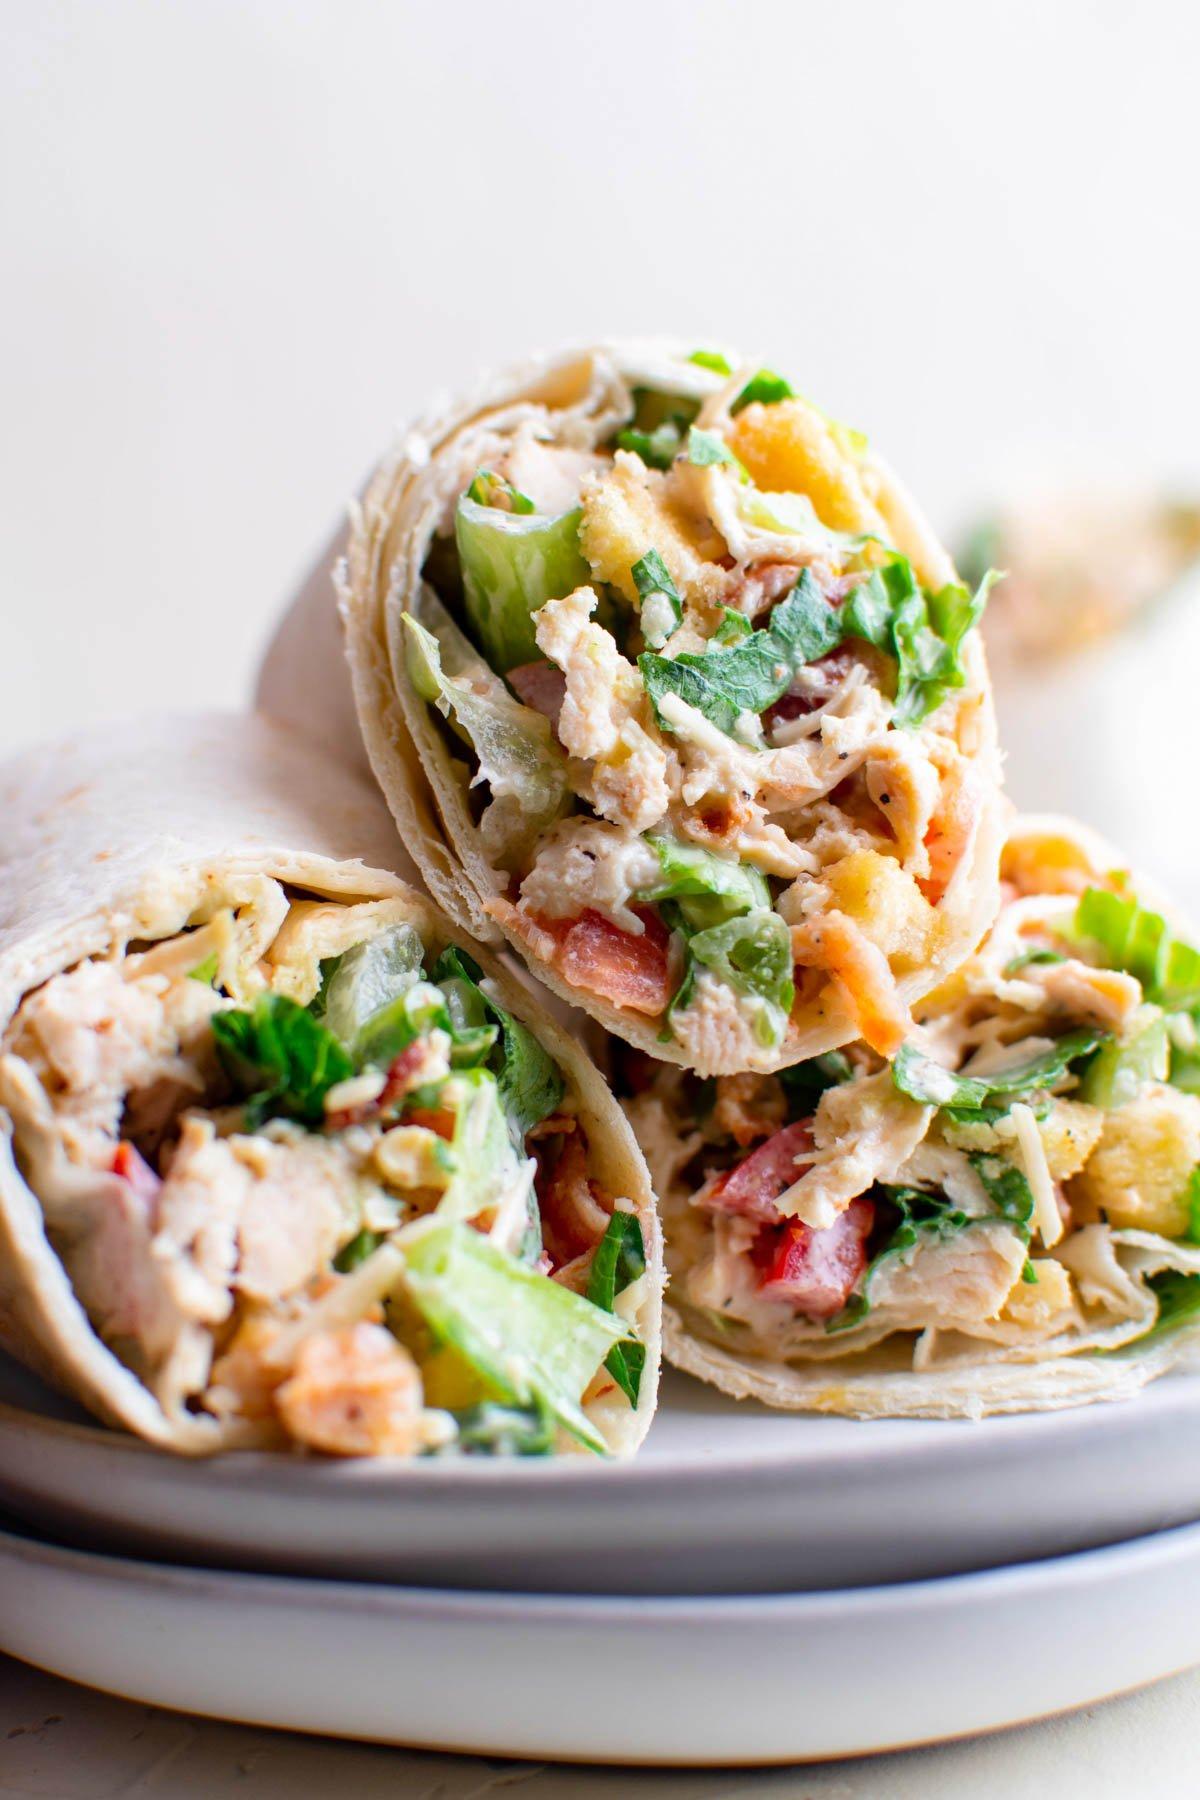 chicken caesar salad in tortillas with toothpicks, white plates